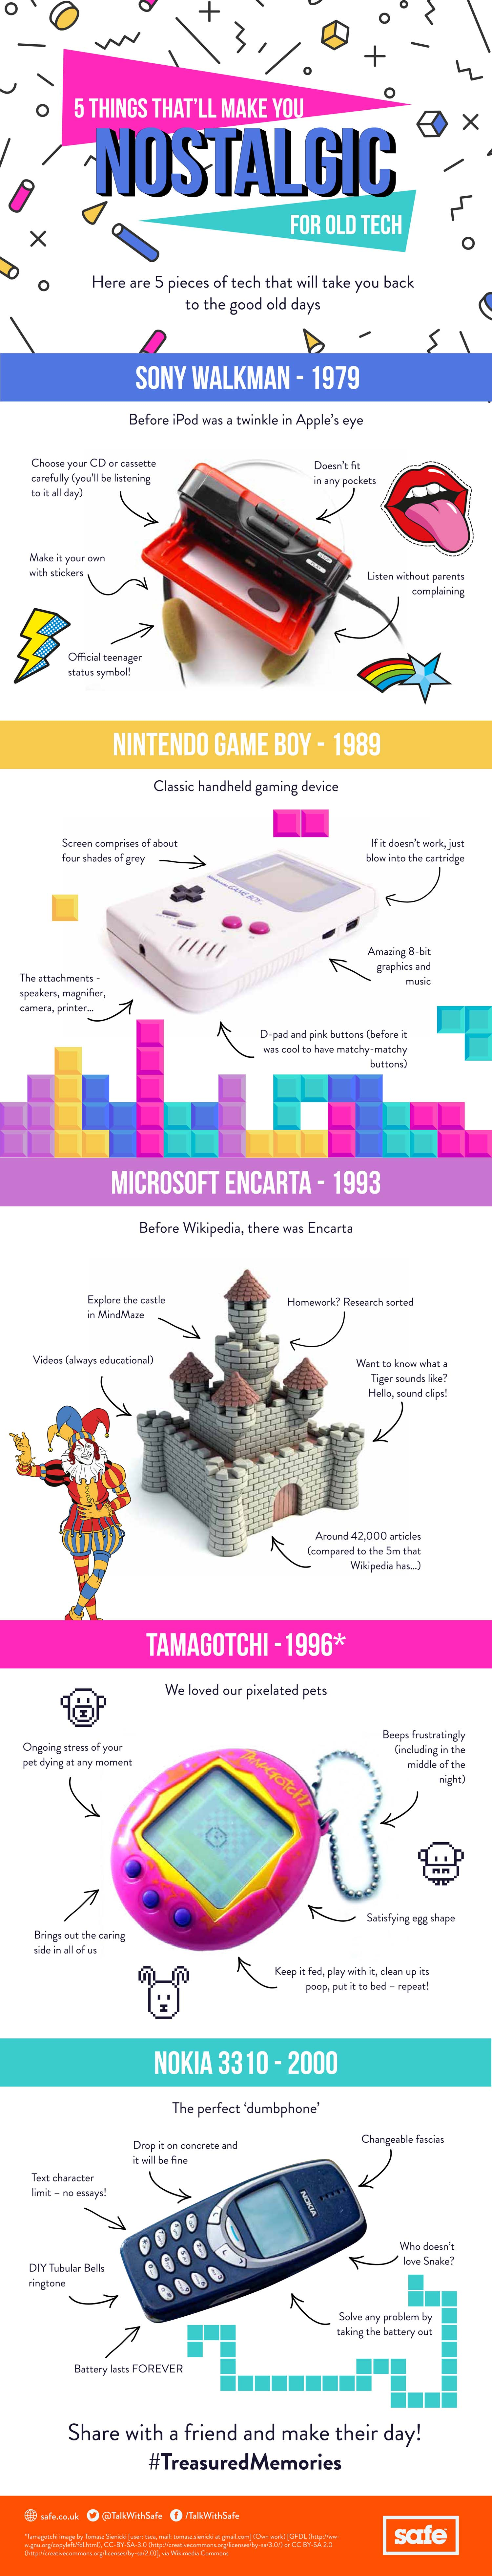 nostalgic-tech-infographic